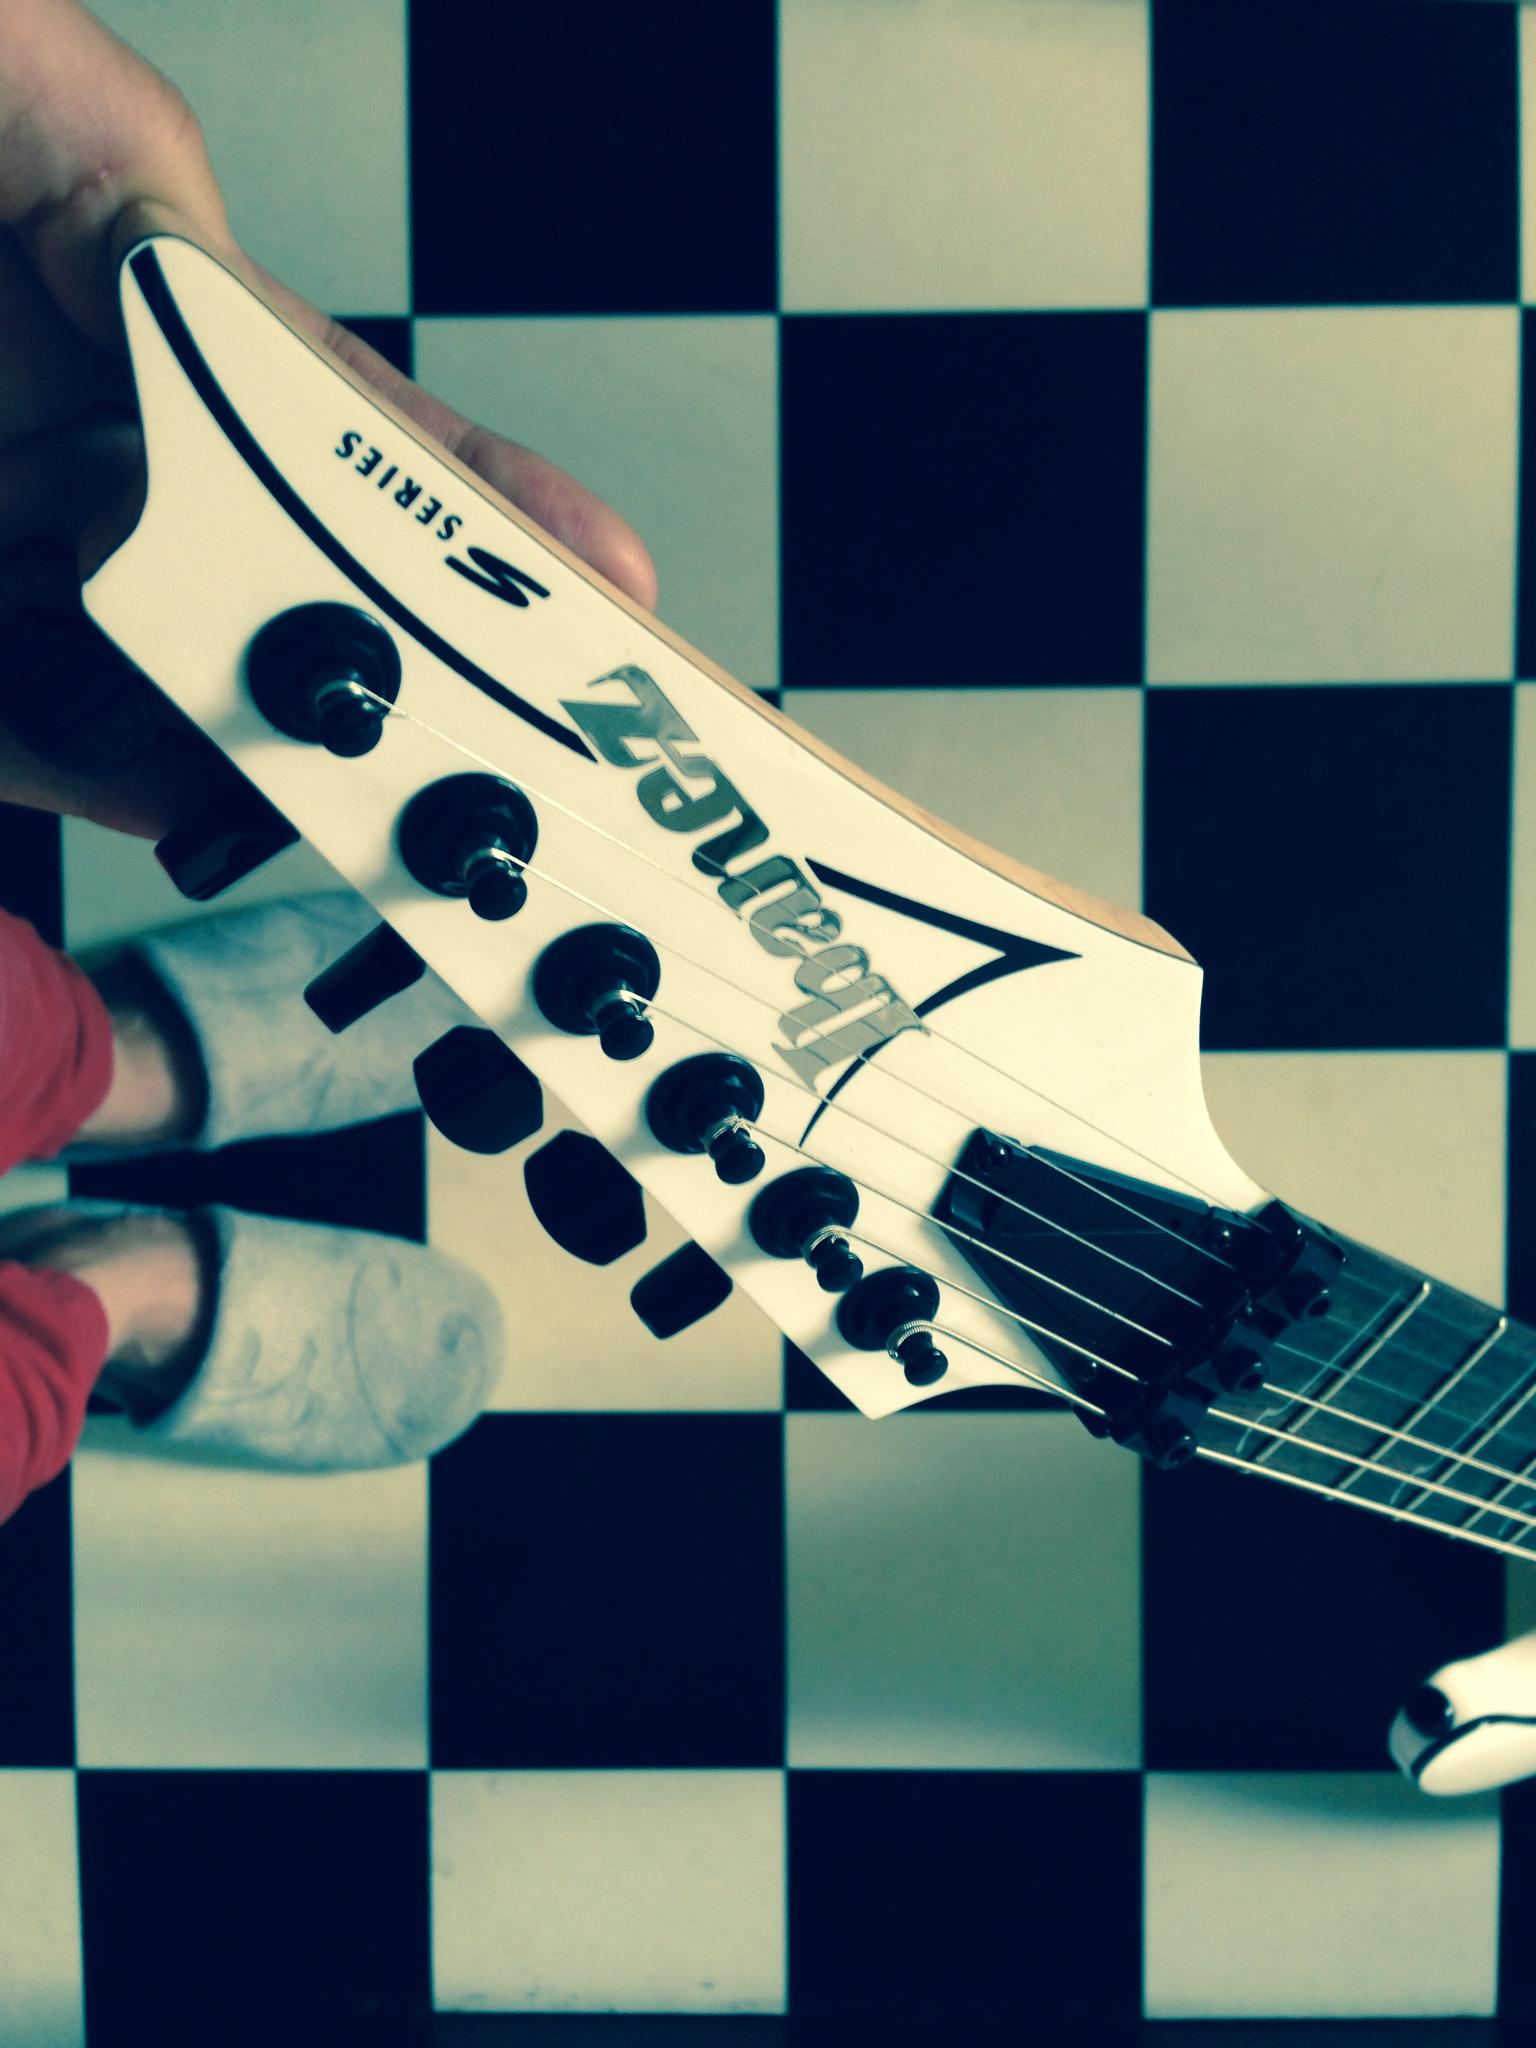 Ibanez-S-series-electric-guitar-white-model-S570B-head-The-Wong-Janice.JPG